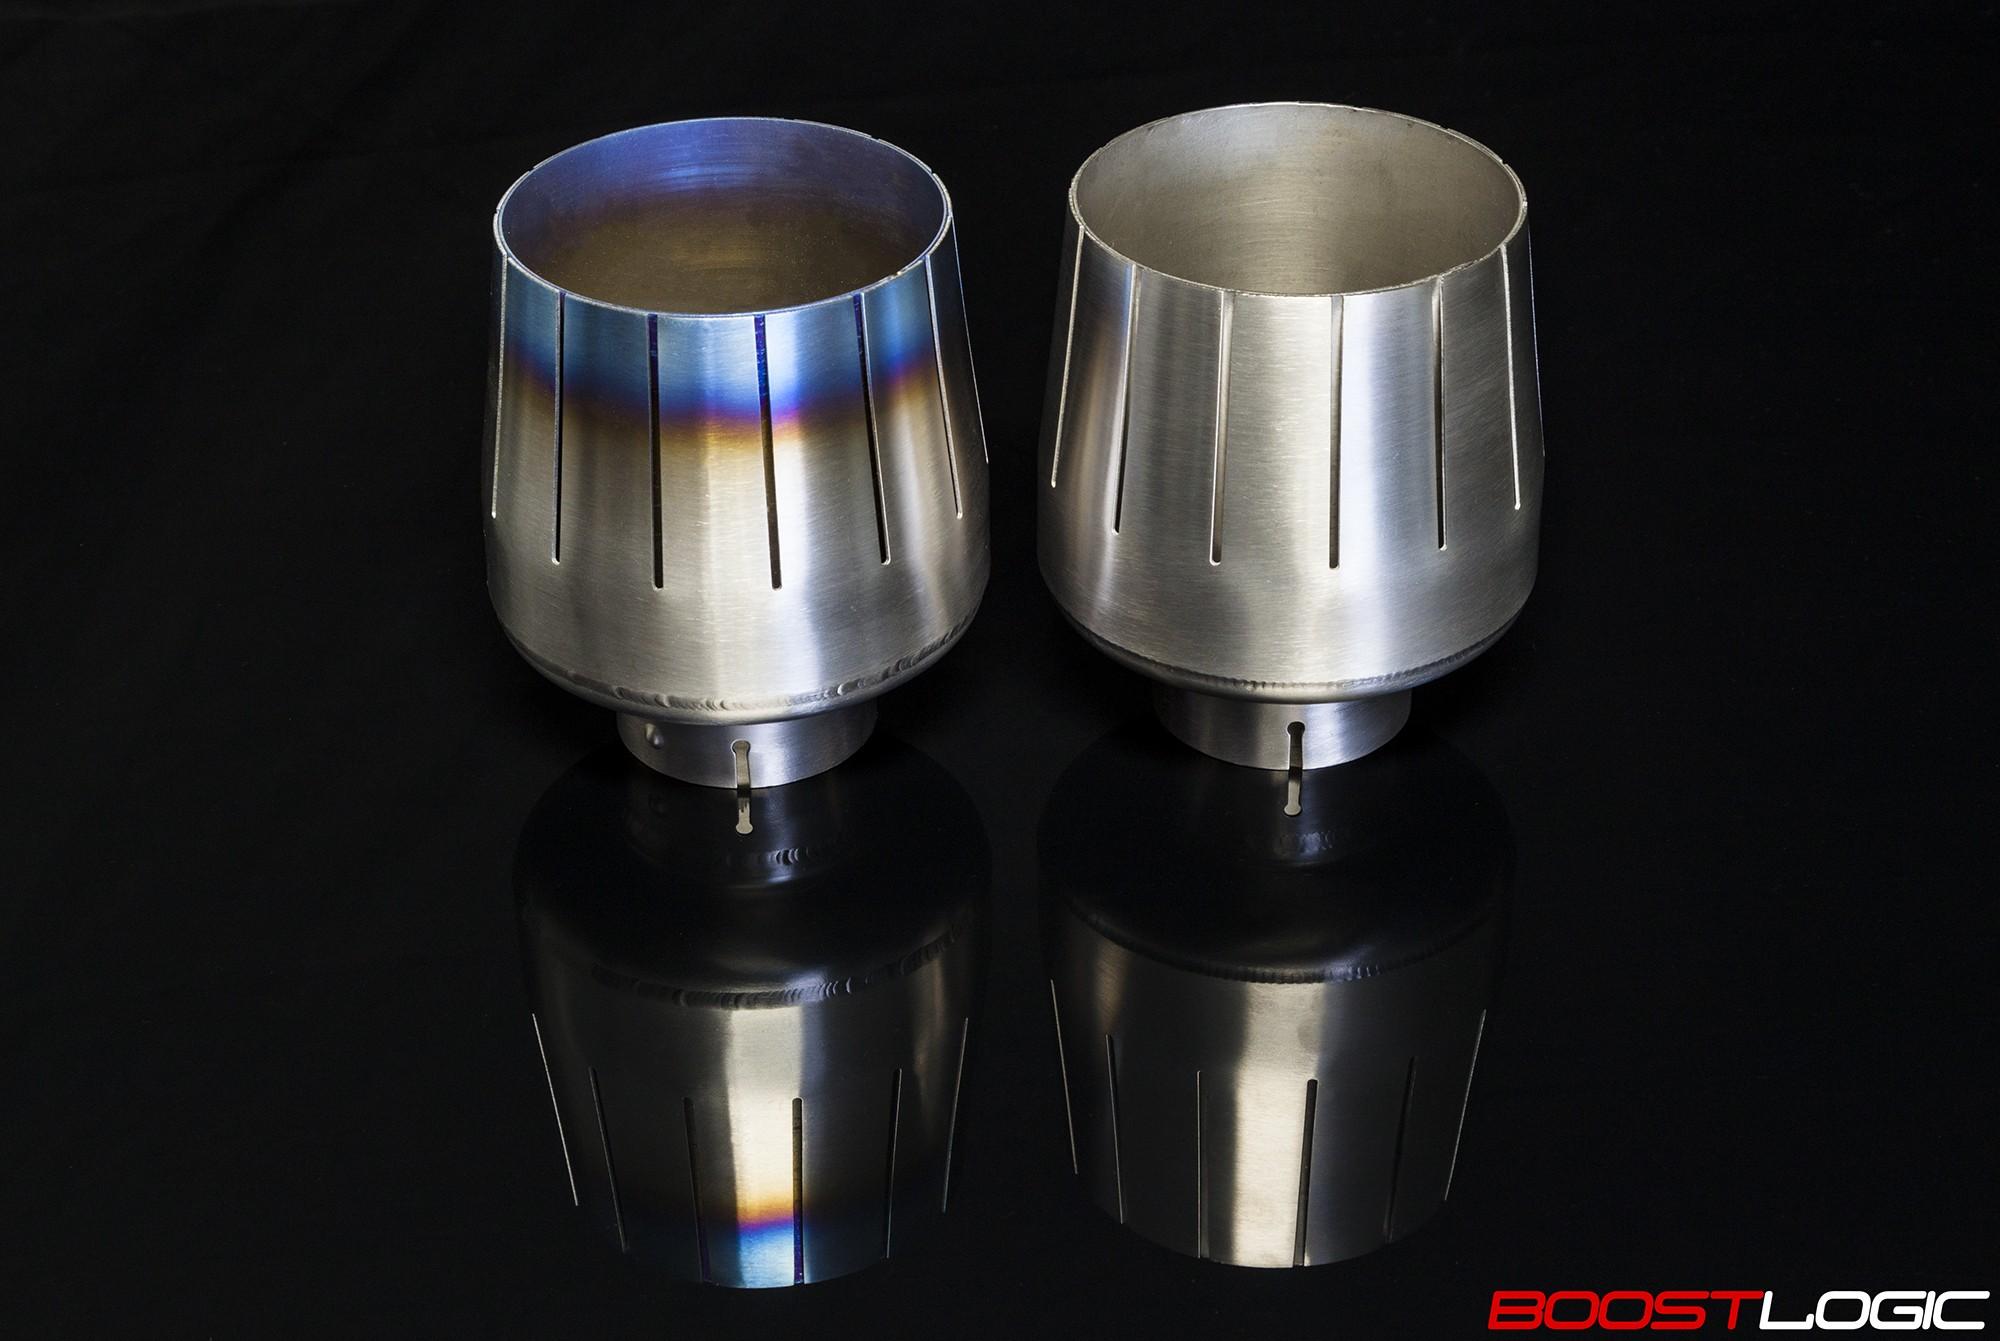 titanium exhaust f16 tip set nissan r35 gtr 09 a9 performance